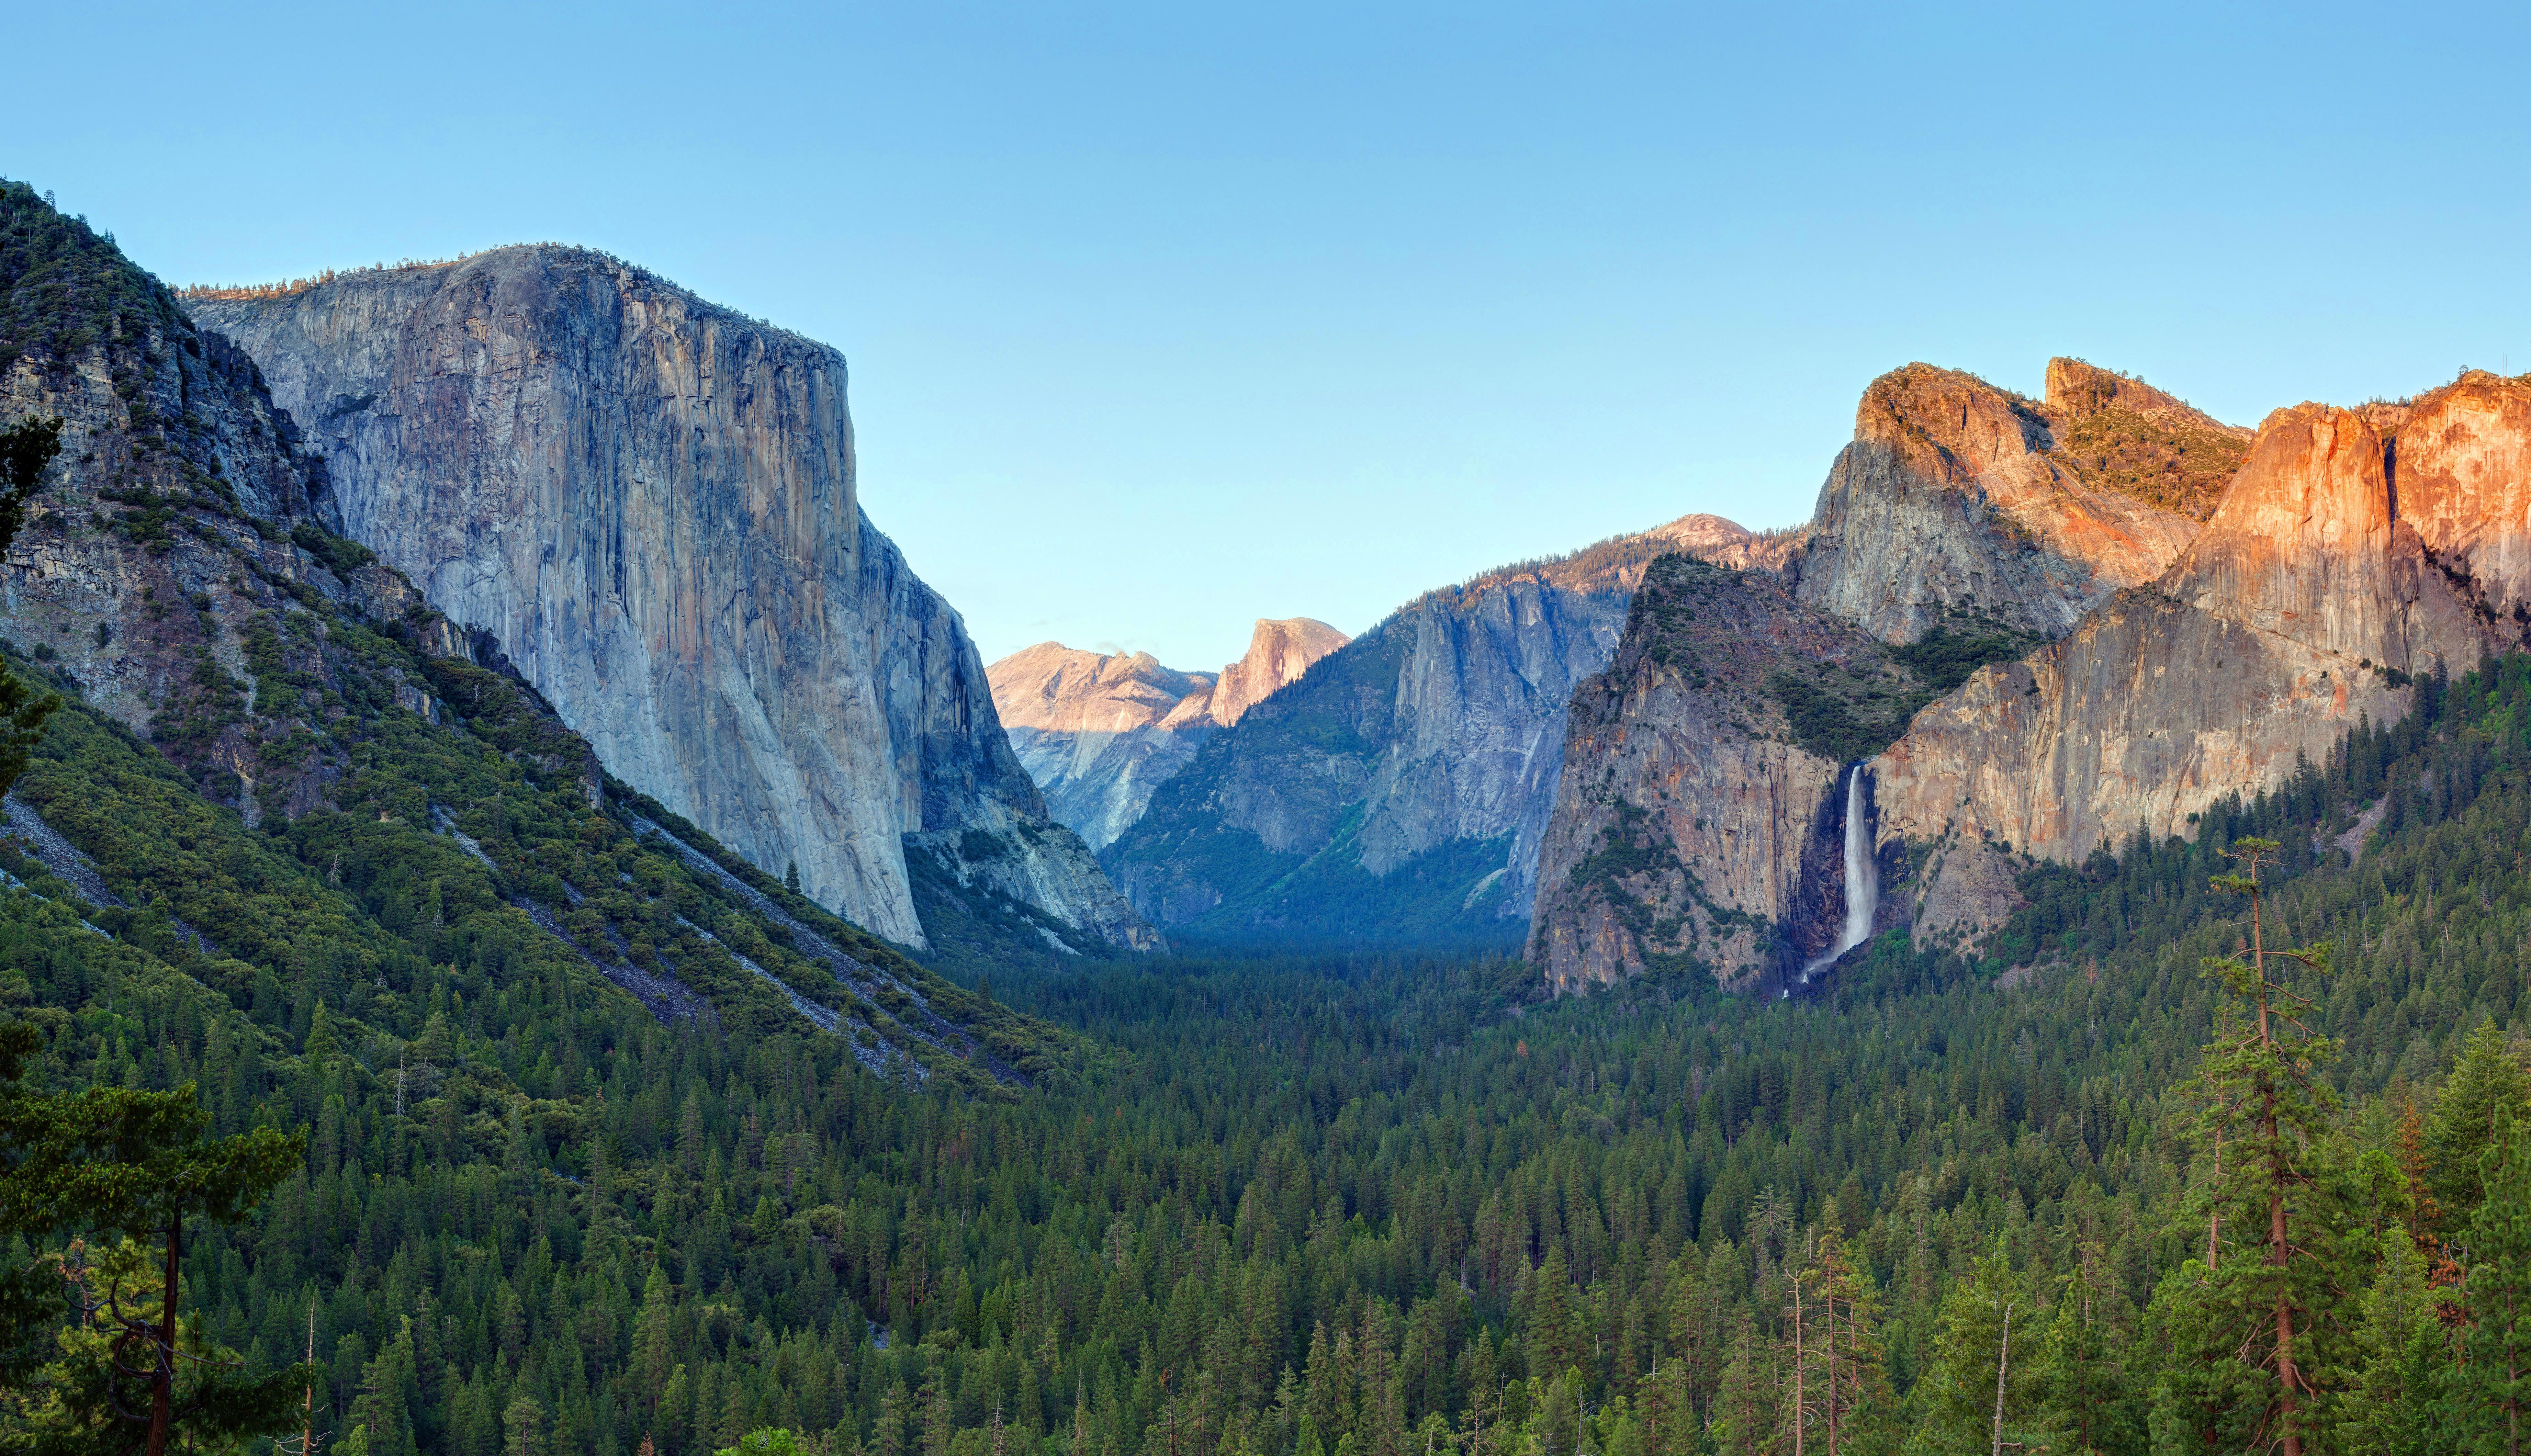 Wallpaper Yosemite 5k 4k Wallpaper Forest Osx Yosemite National Park Yosemite Valley 7368x4239 Wallpaper Teahub Io